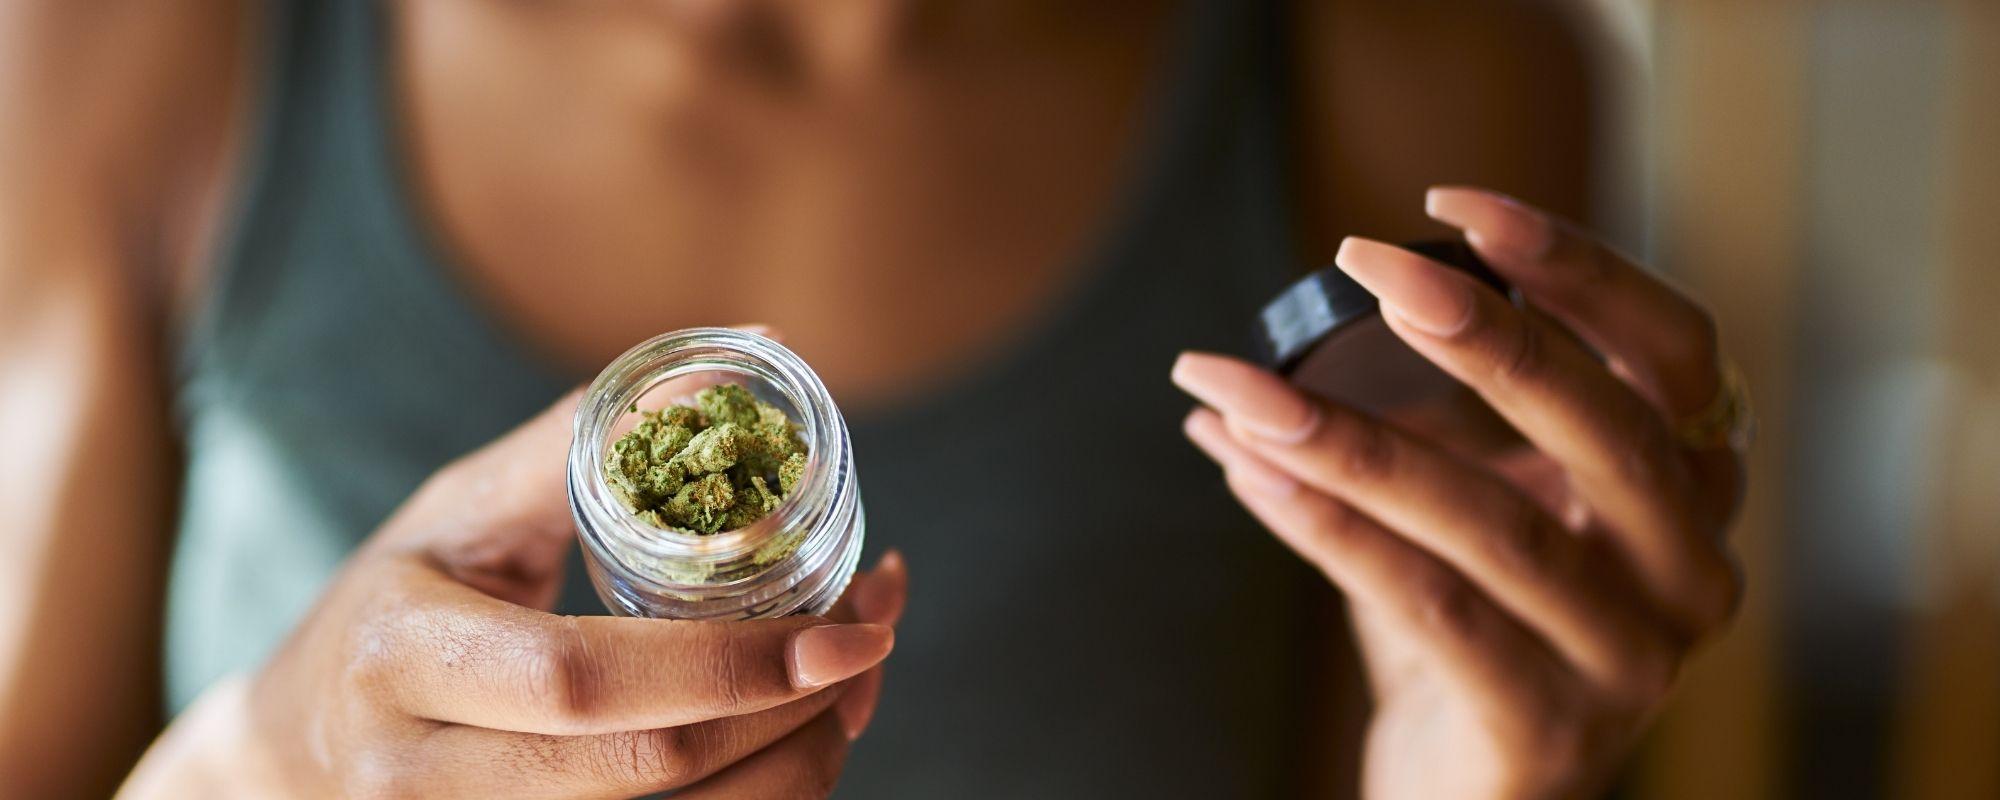 Does Cannabis Help Manage Endometriosis?